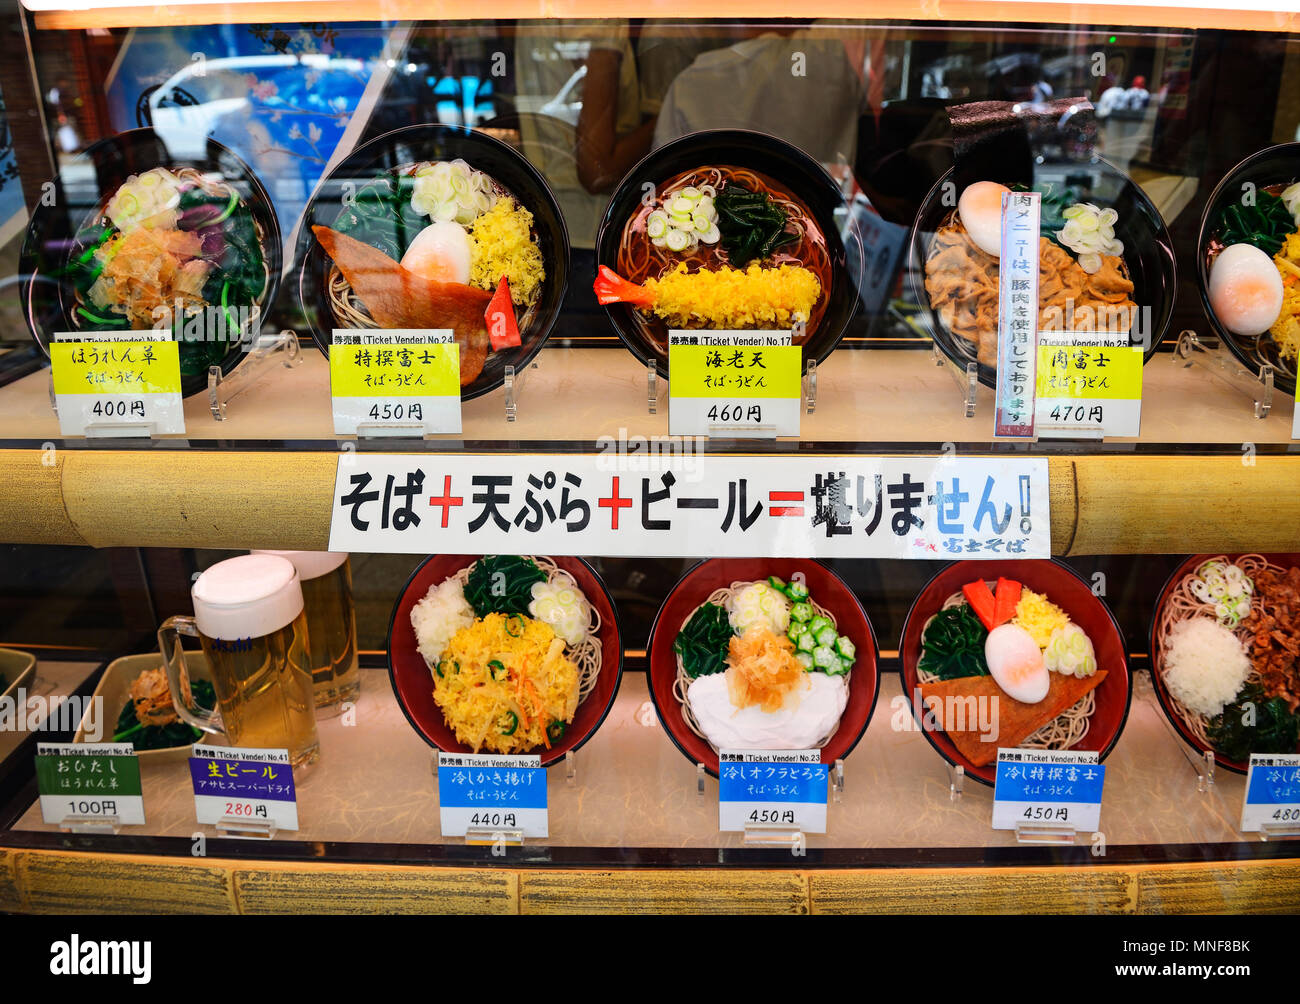 Japanese Dishes Imágenes De Stock   Japanese Dishes Fotos De Stock ... cbe8825bec5d